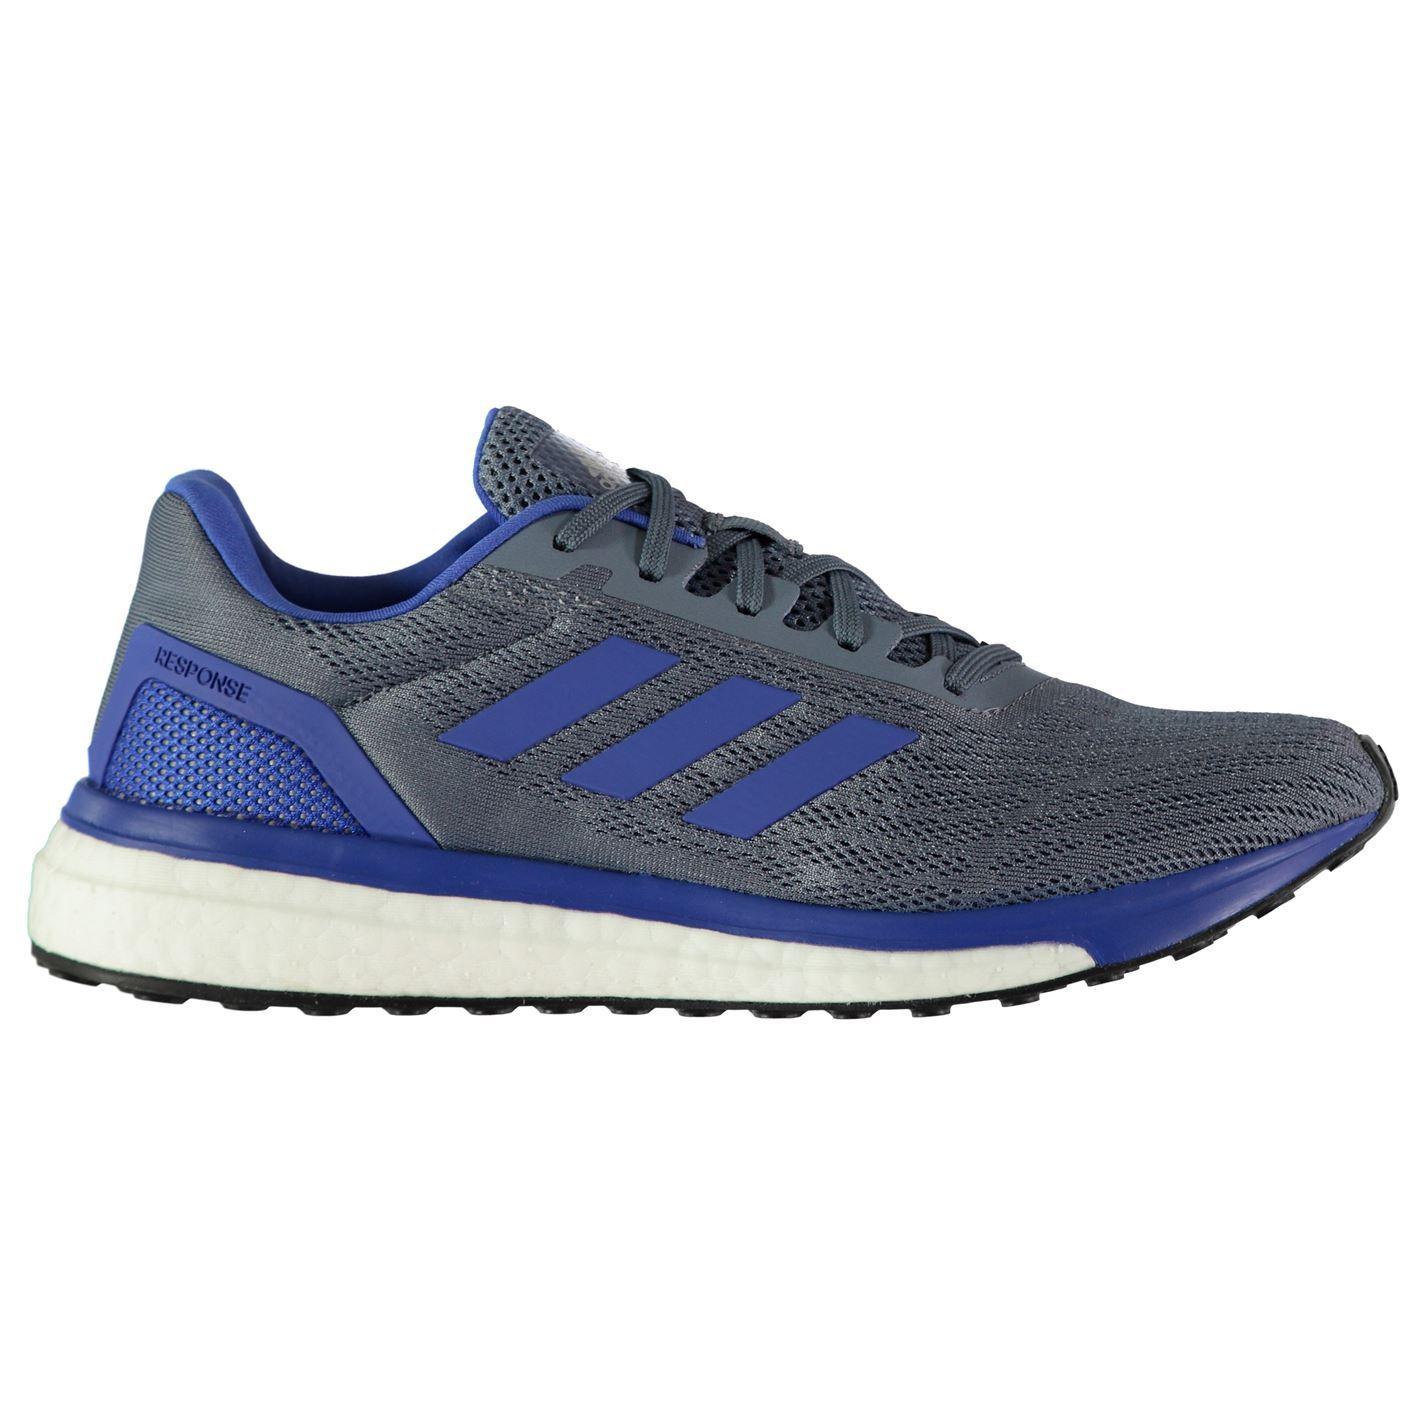 Adidas Para Transpirable Respuesta Hombre Respuesta Transpirable Zapatillas carretera d34e90